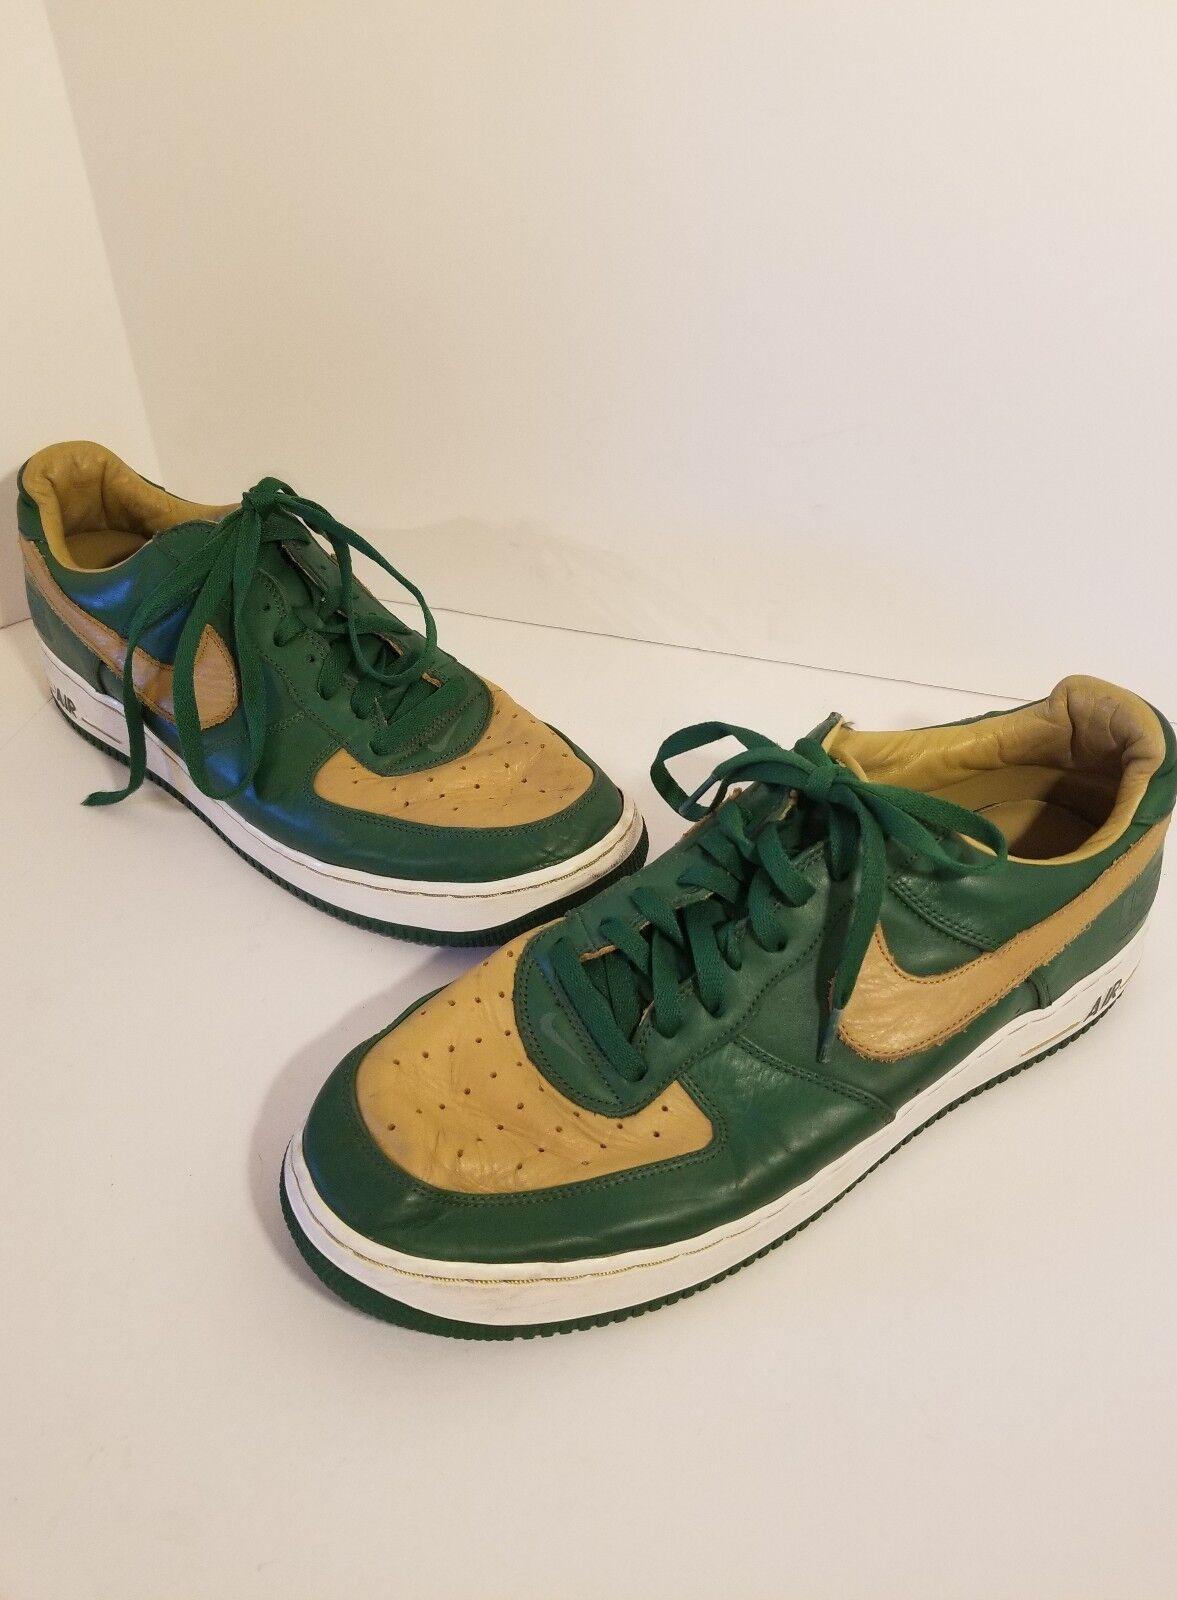 bce83019bd Nike Men's Air Force1 LTD SZ 15 Lebron James Foliage Green gold Sneaker  SVSM Low ntjvgg9475-Athletic Shoes